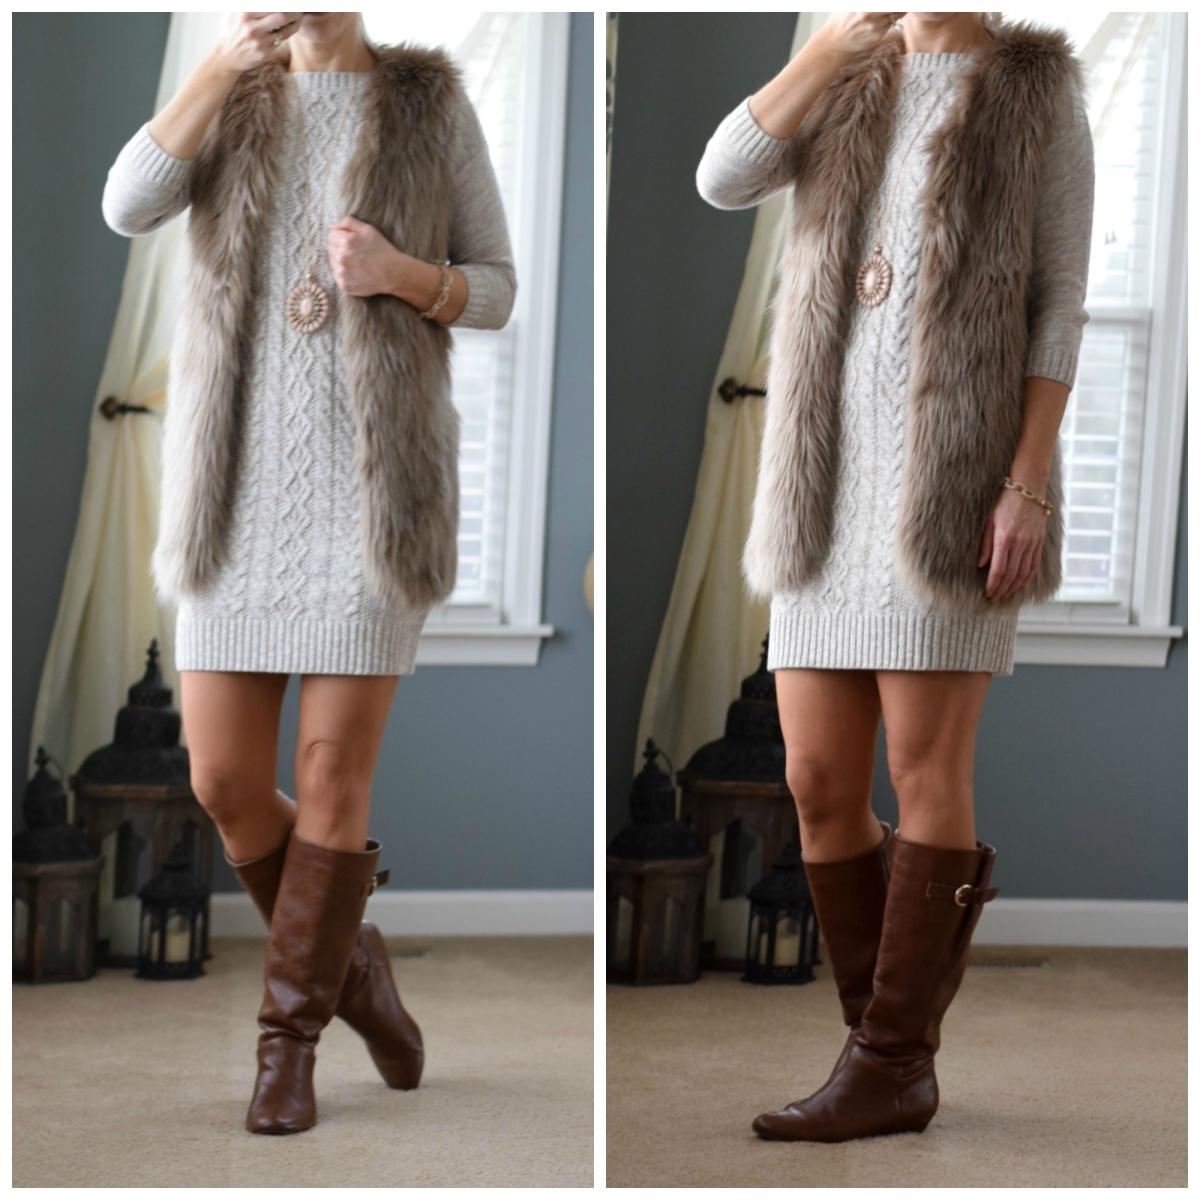 Faux fur vest and a sweater dress!